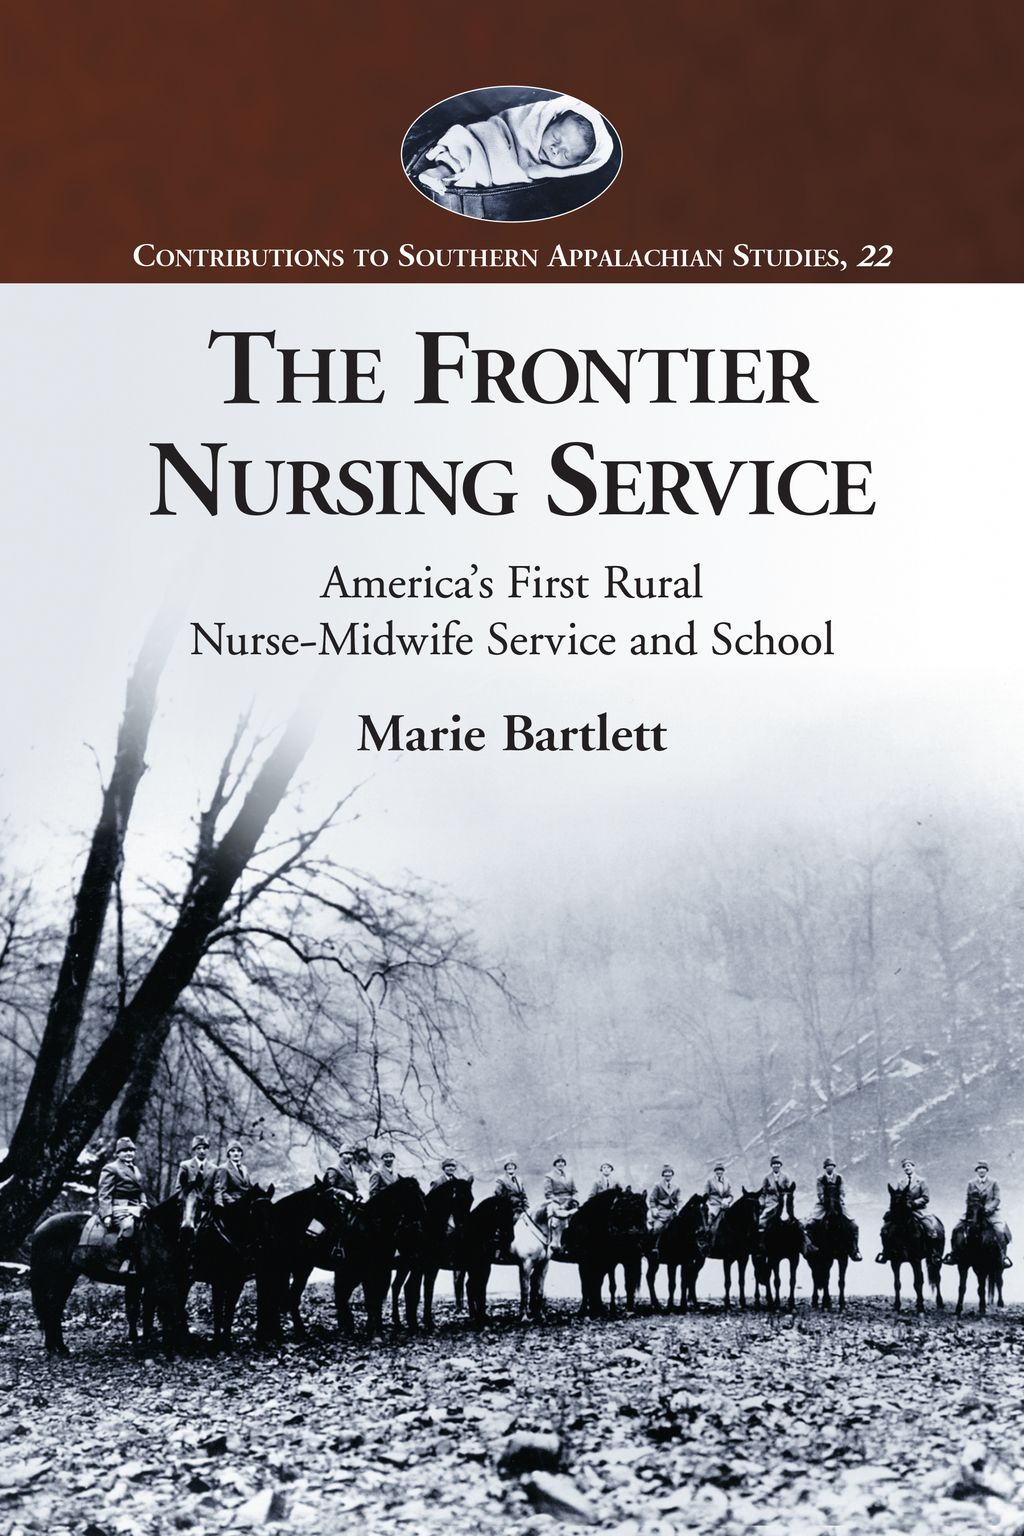 The Frontier Nursing Service America's First Rural Nurse